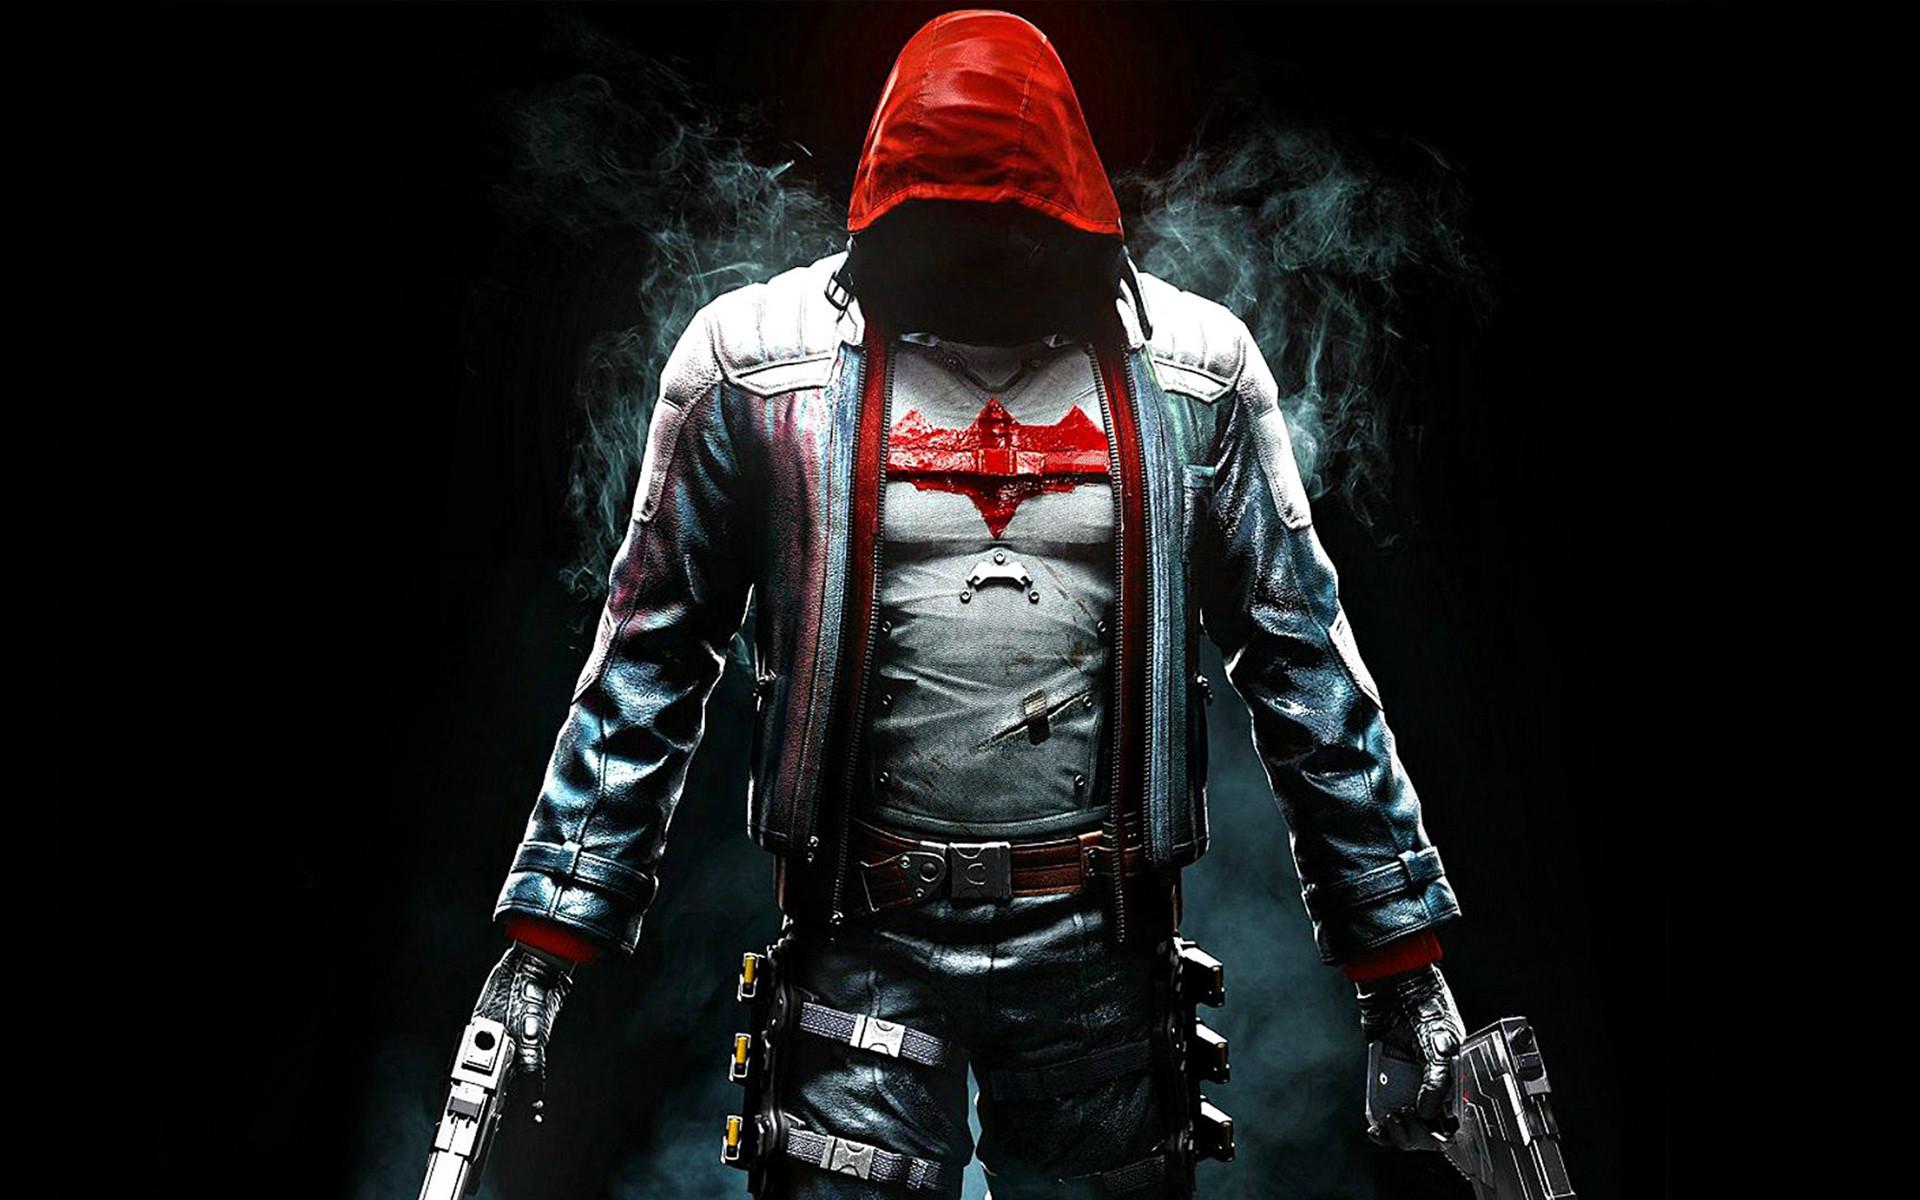 Jason Todd Red Hood Batman Arkham Knight Wallpapers | HD Wallpapers